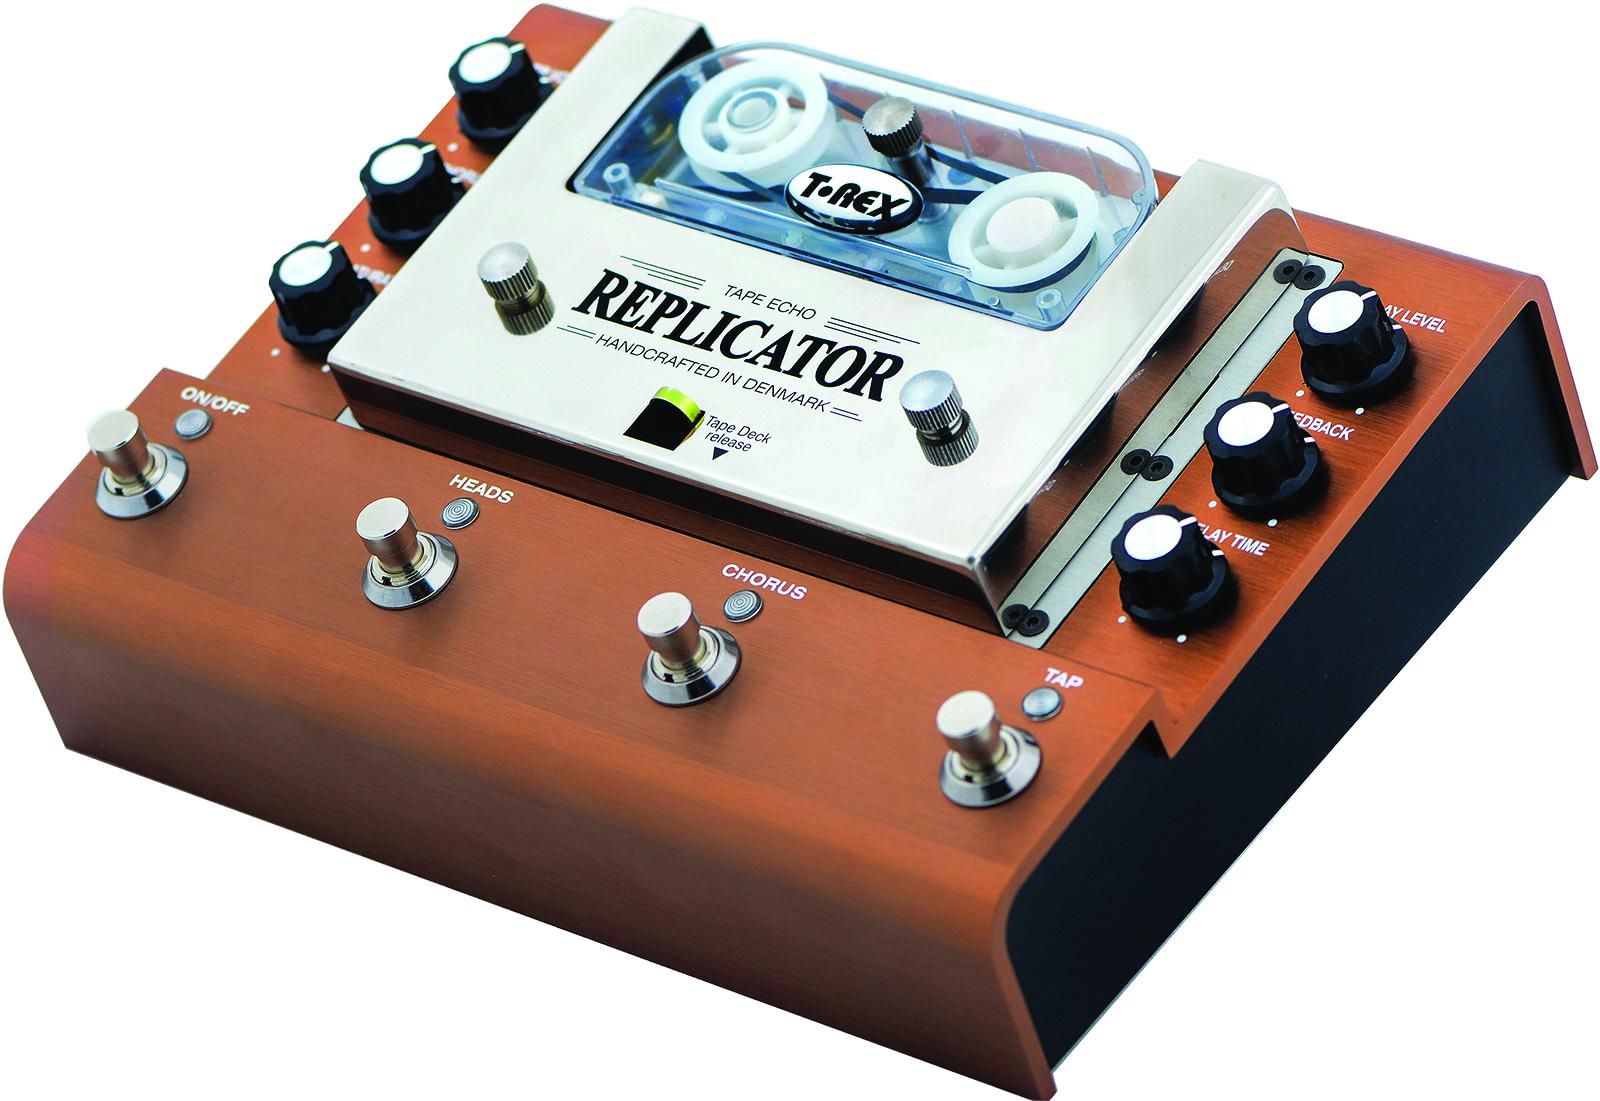 t-rex-replicator-tape-echo-2